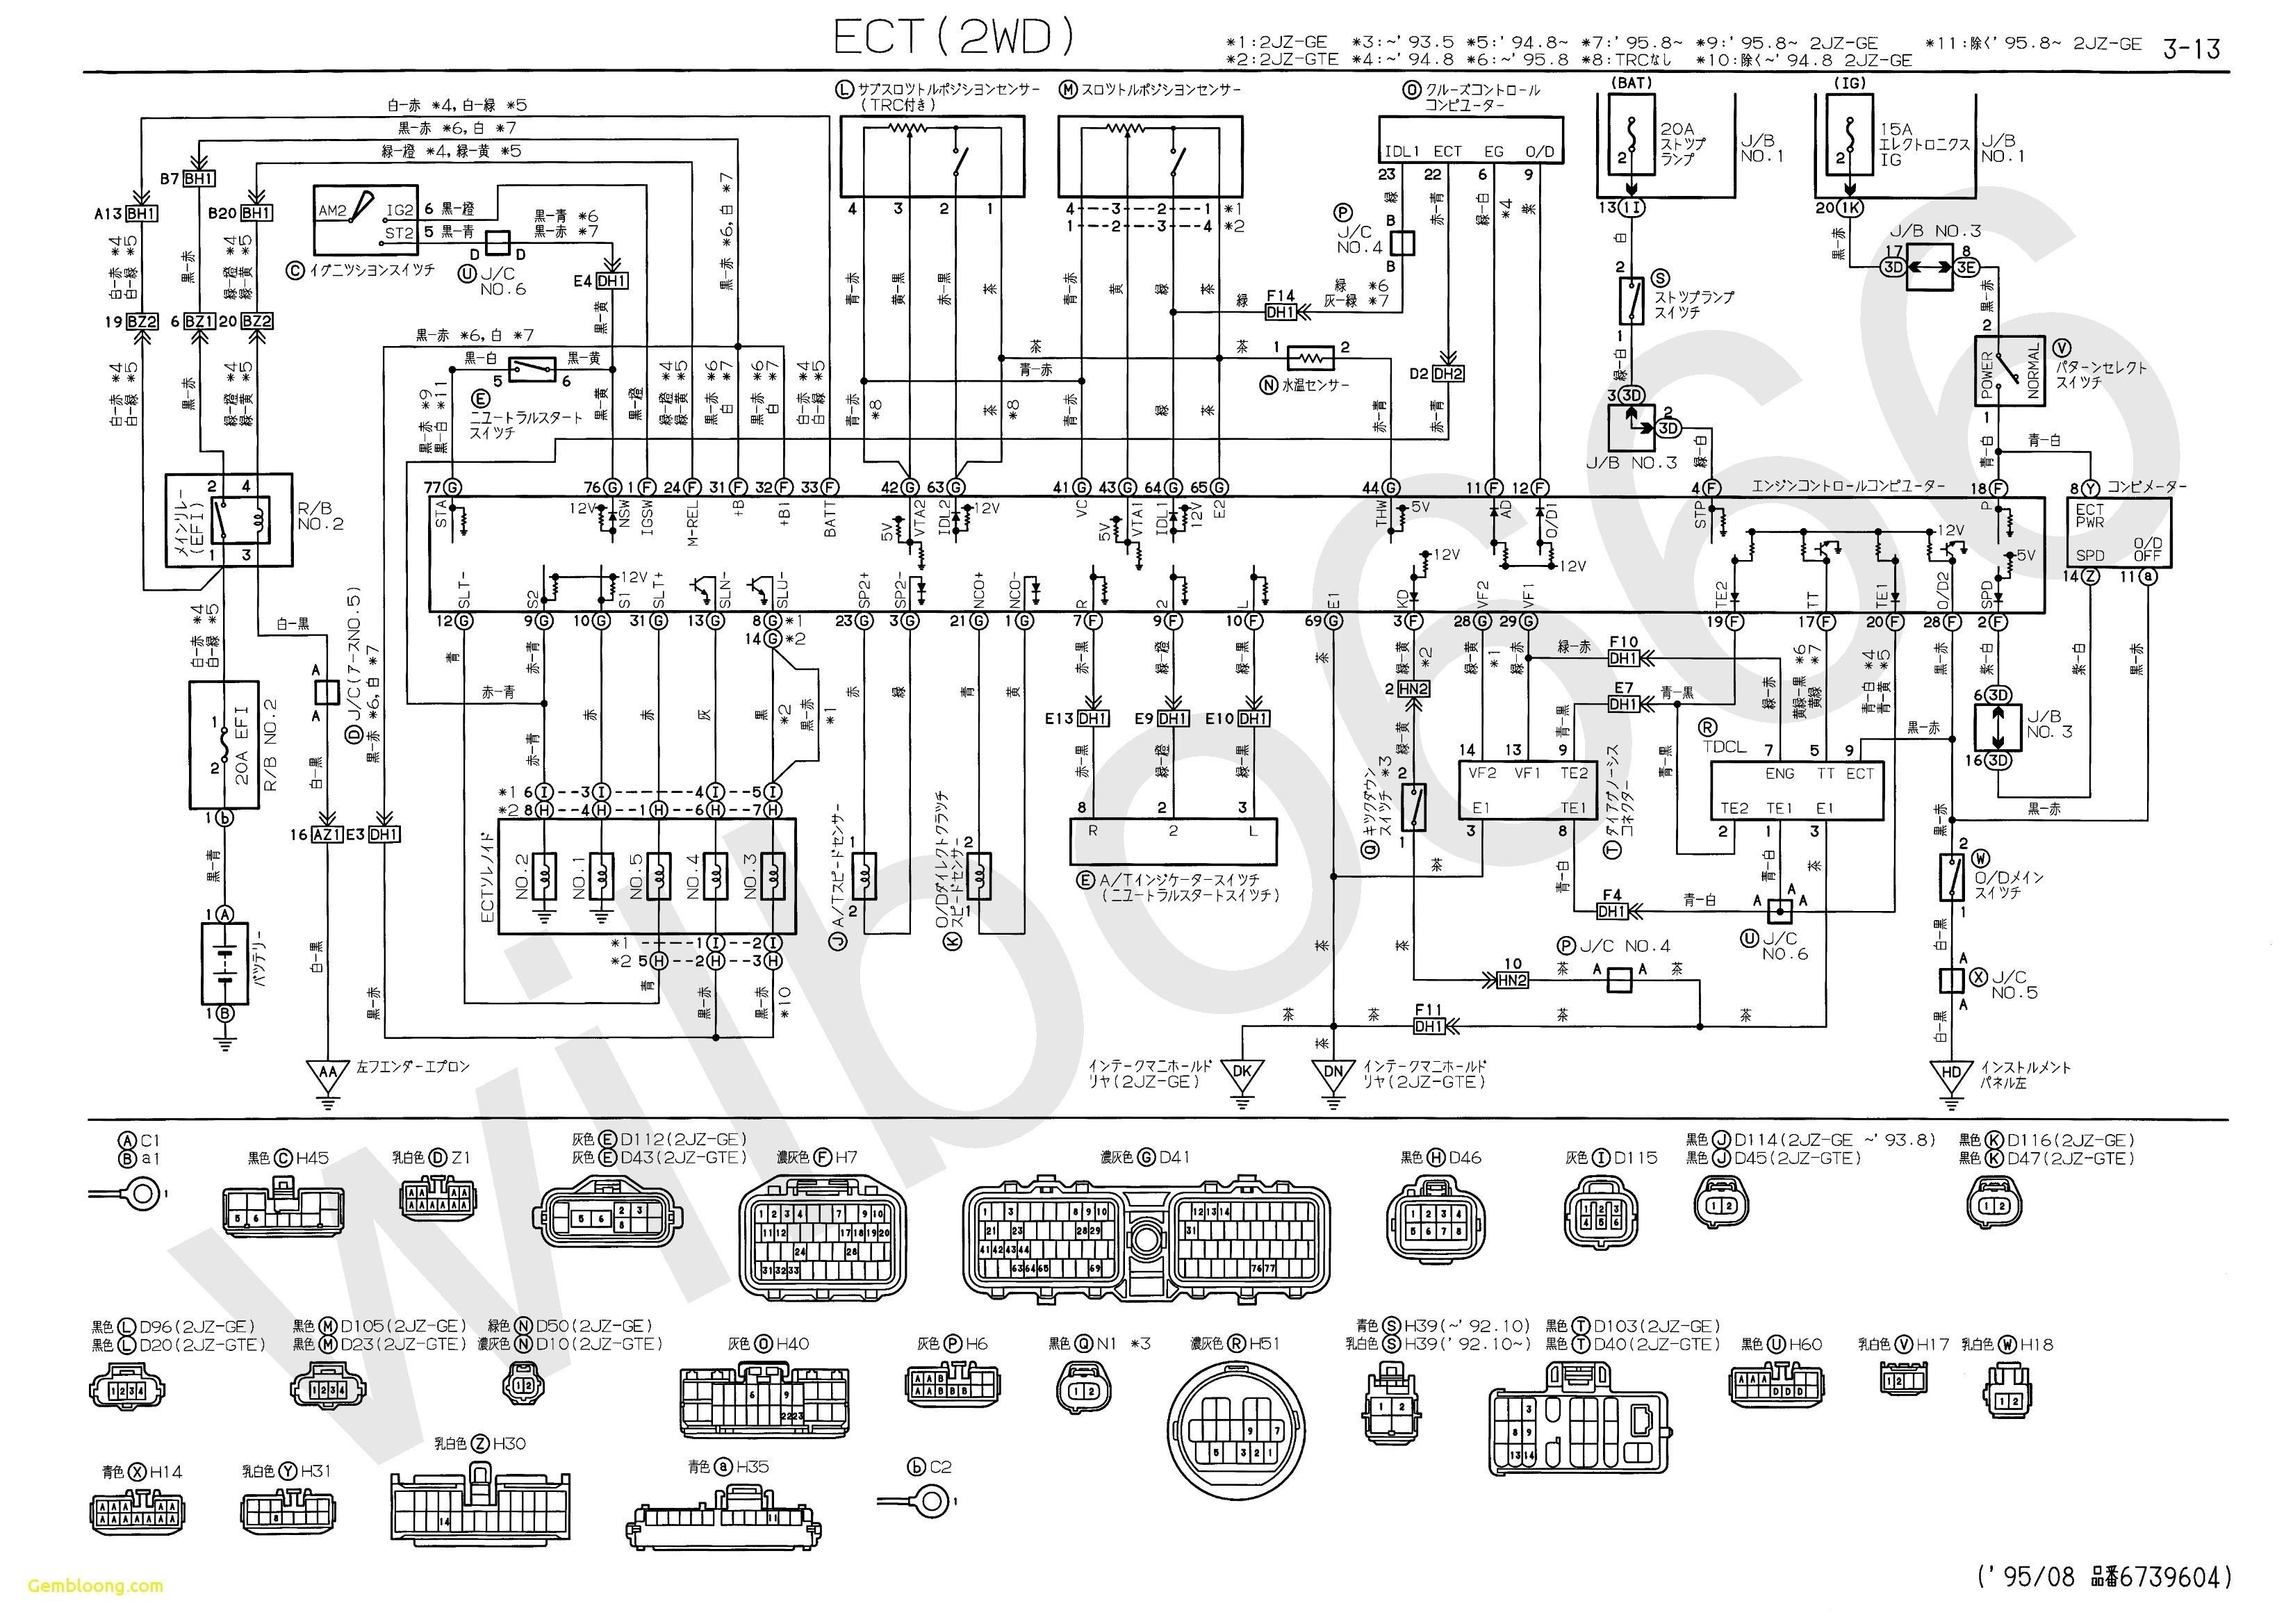 1993 toyota Camry Engine Diagram Wiring Diagram toyota Avanza Expert Wiring Diagrams Of 1993 toyota Camry Engine Diagram